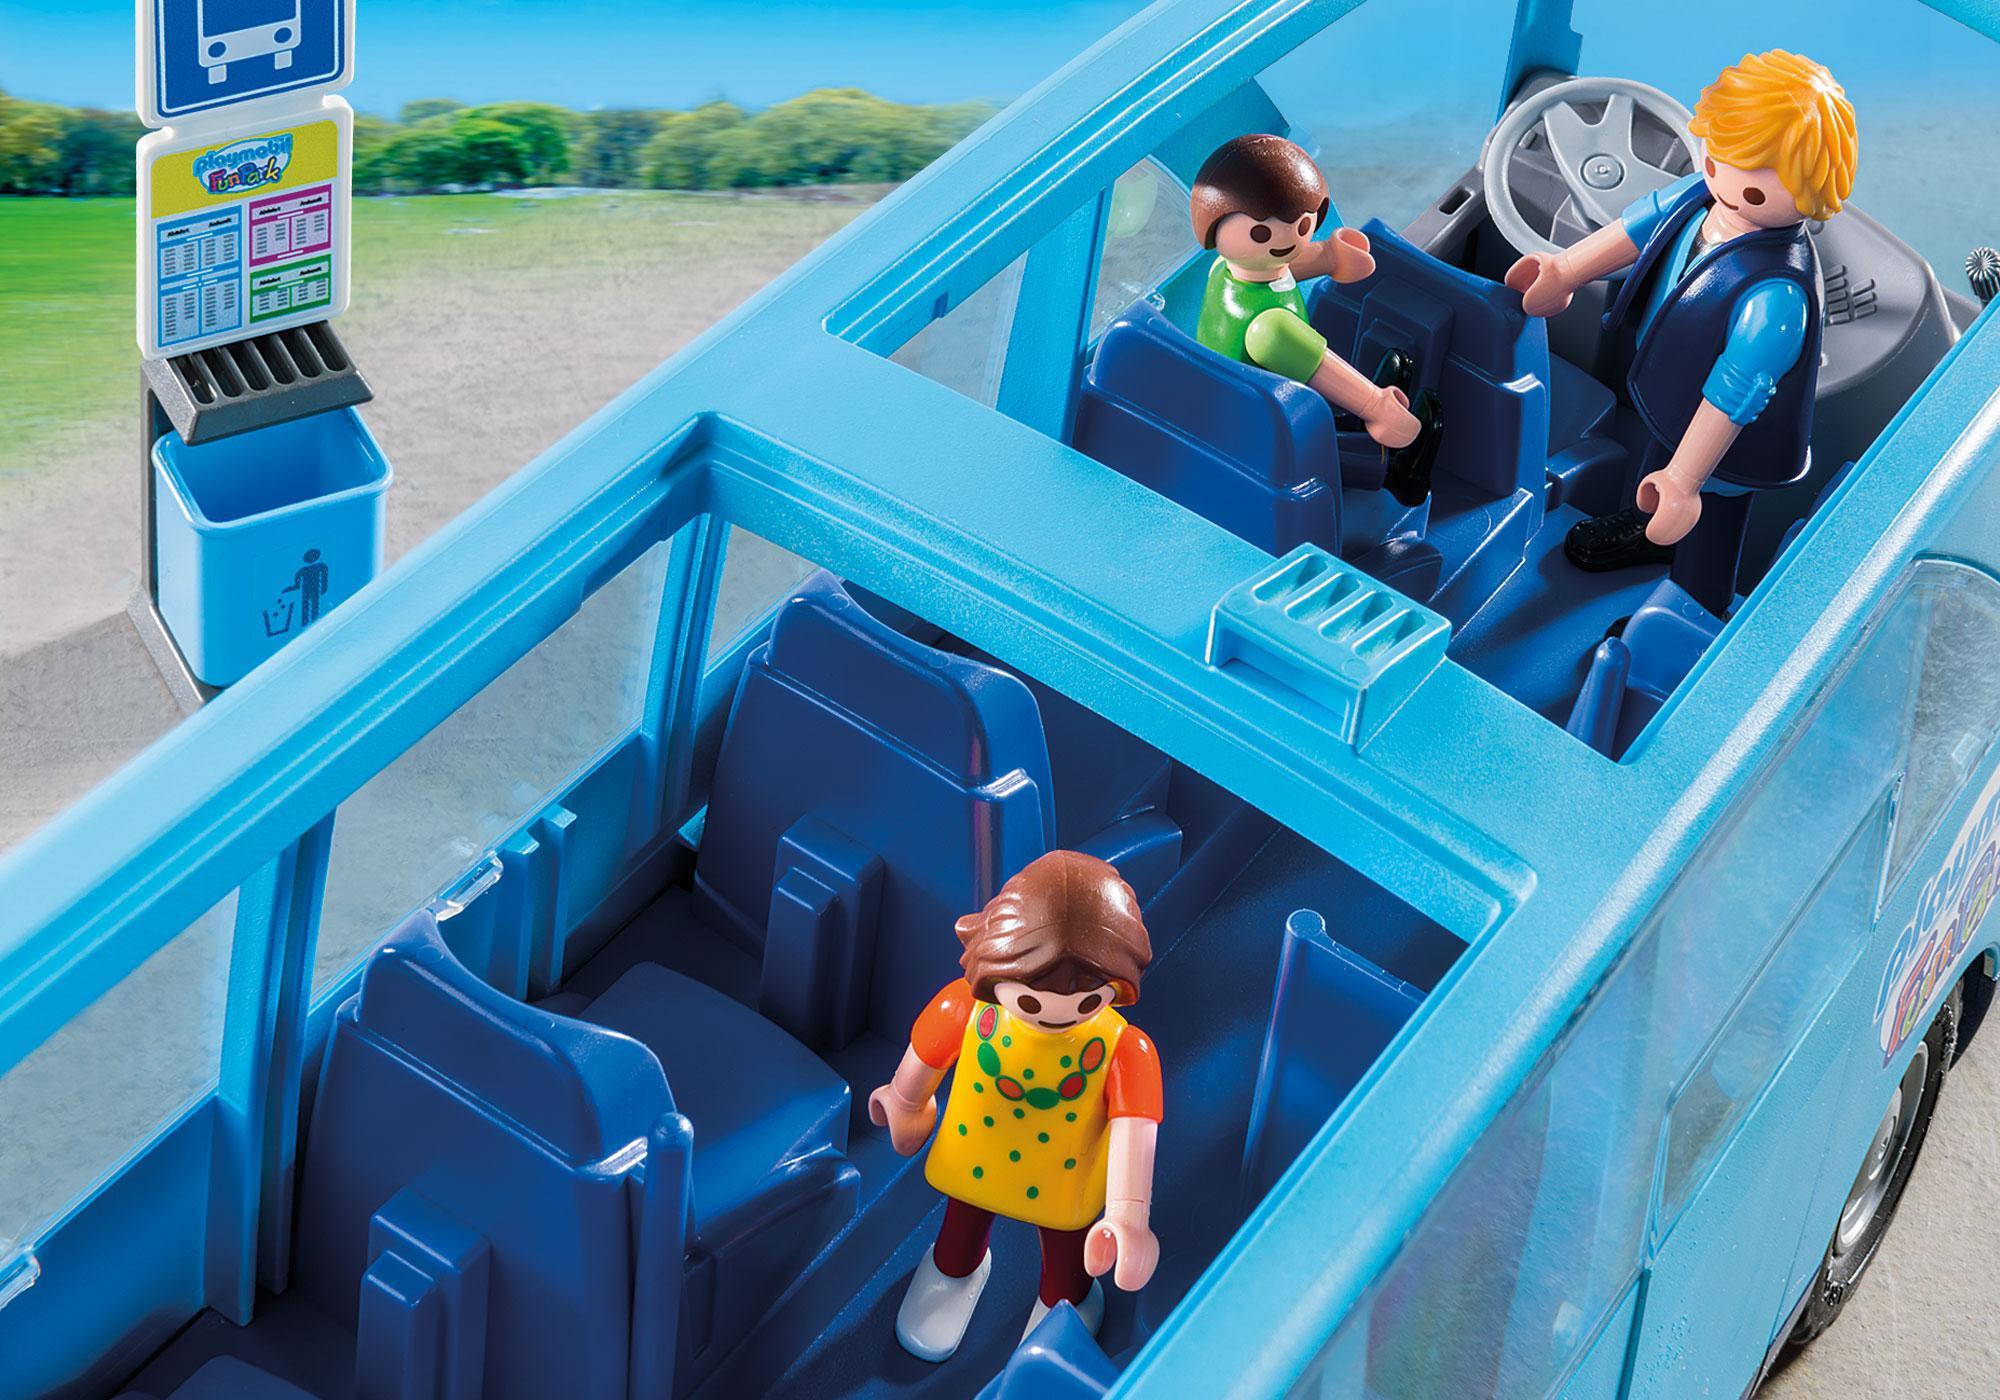 http://media.playmobil.com/i/playmobil/9117_product_extra2/PLAYMOBIL-FunPark Bus navetta